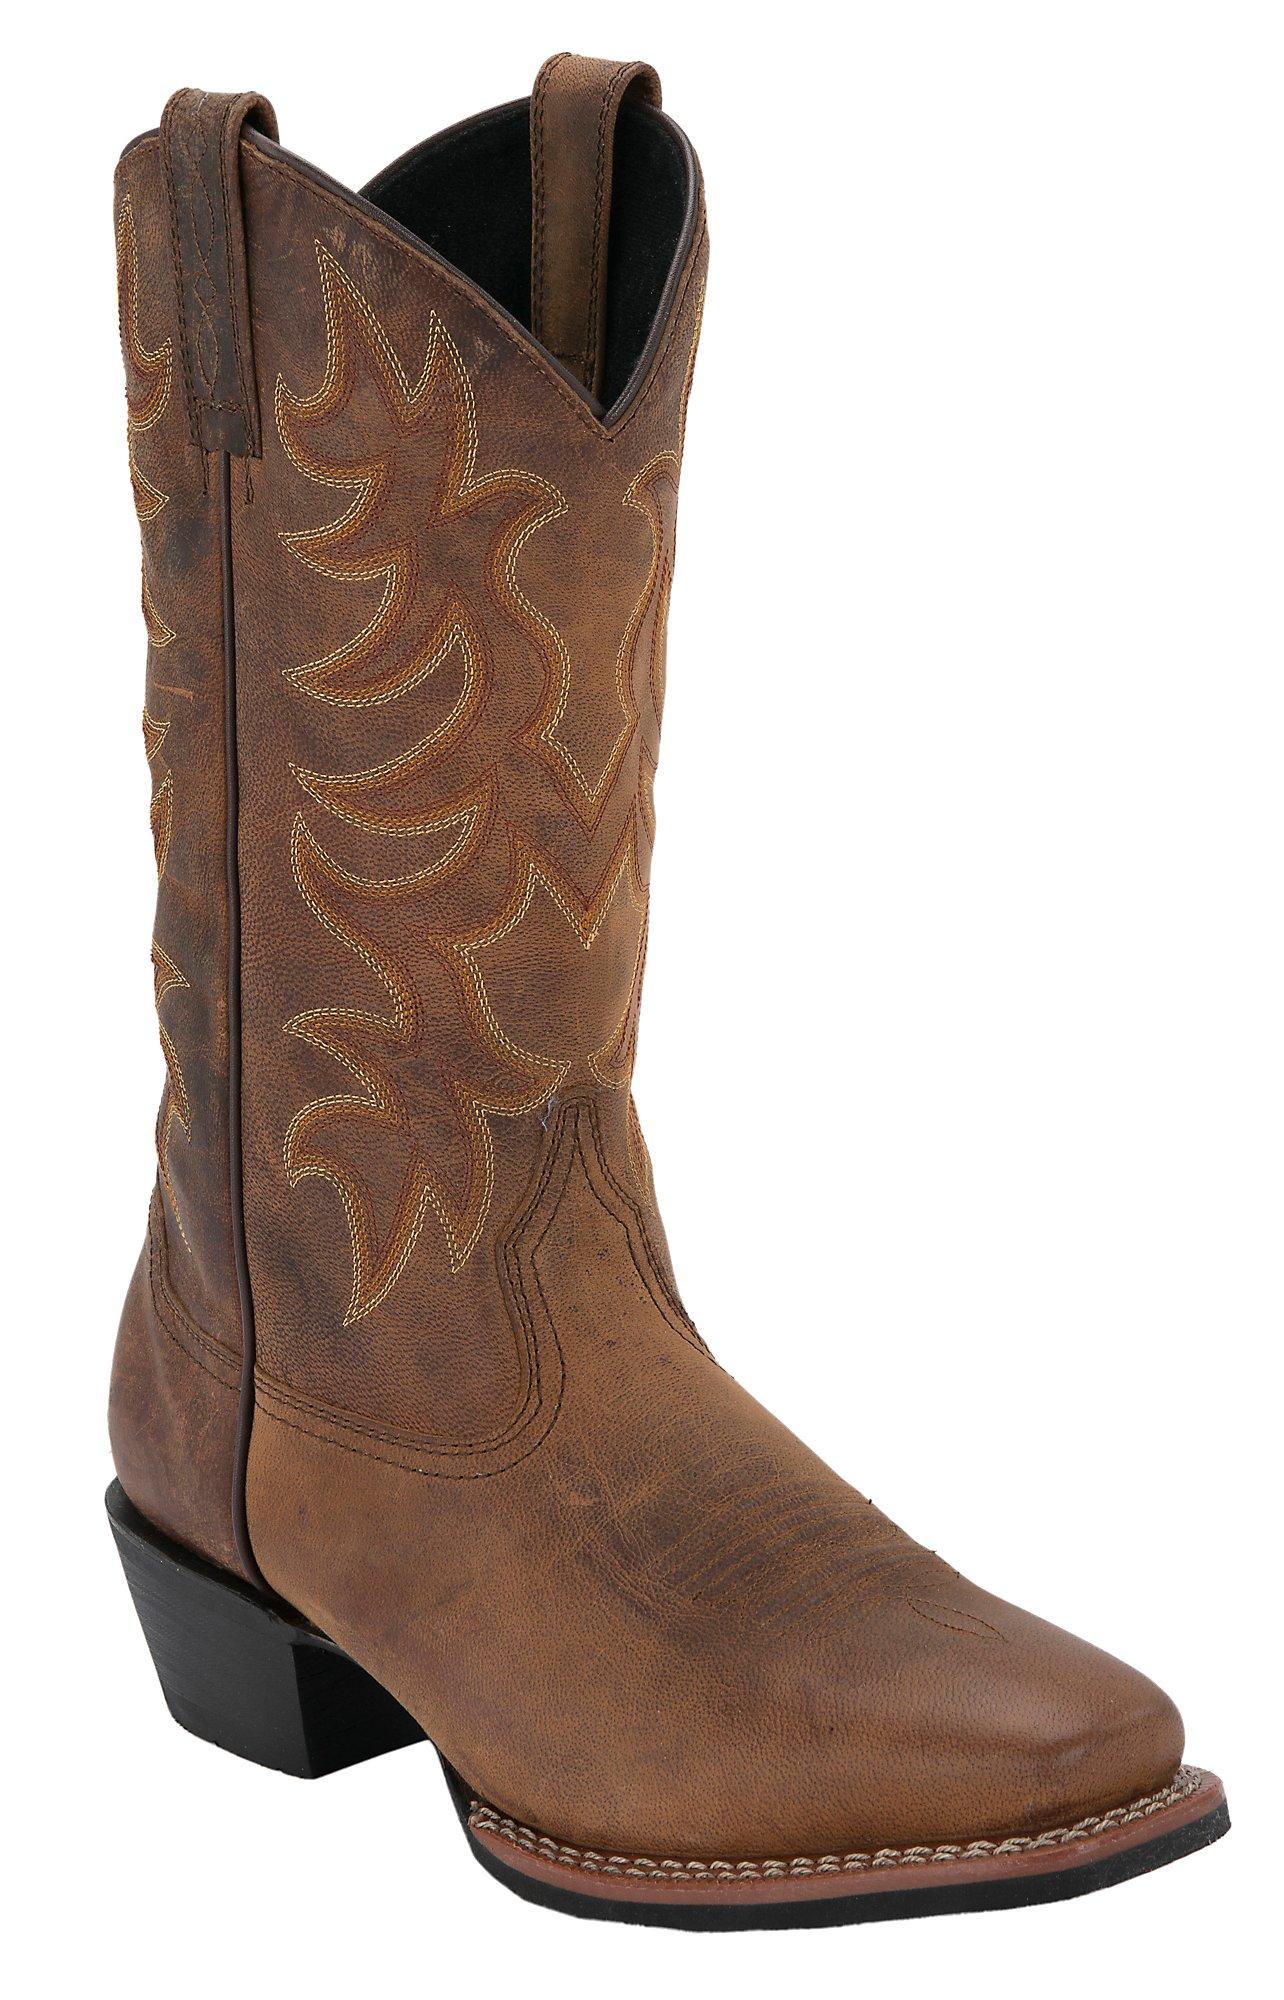 Cheap Cowboy Boots For Men   Affordable Cowboy Boots   Cavender's